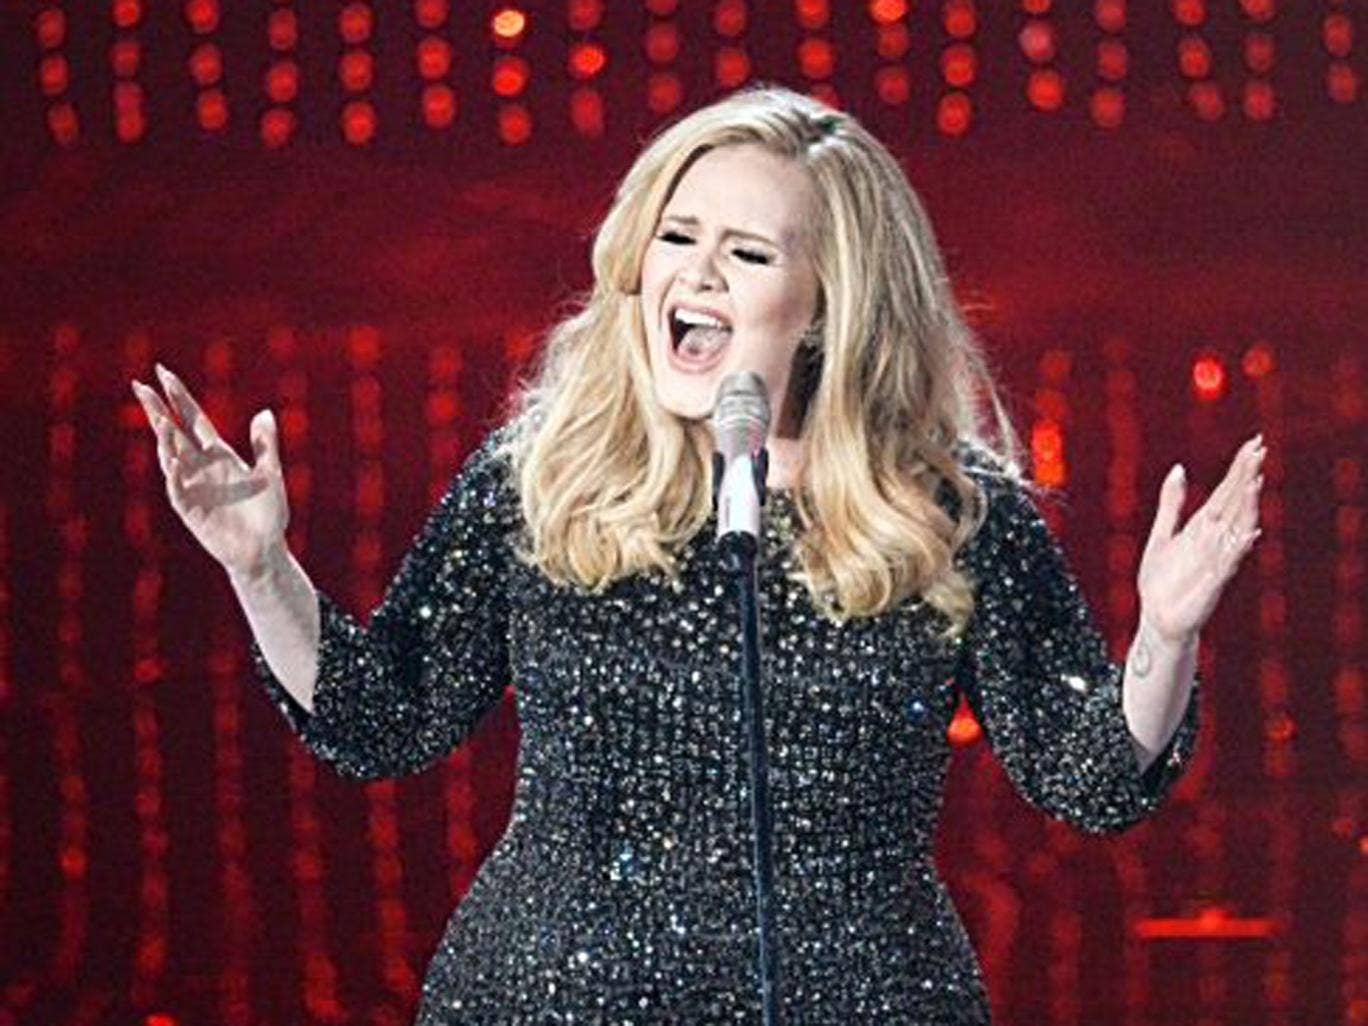 Digging deep: Adele